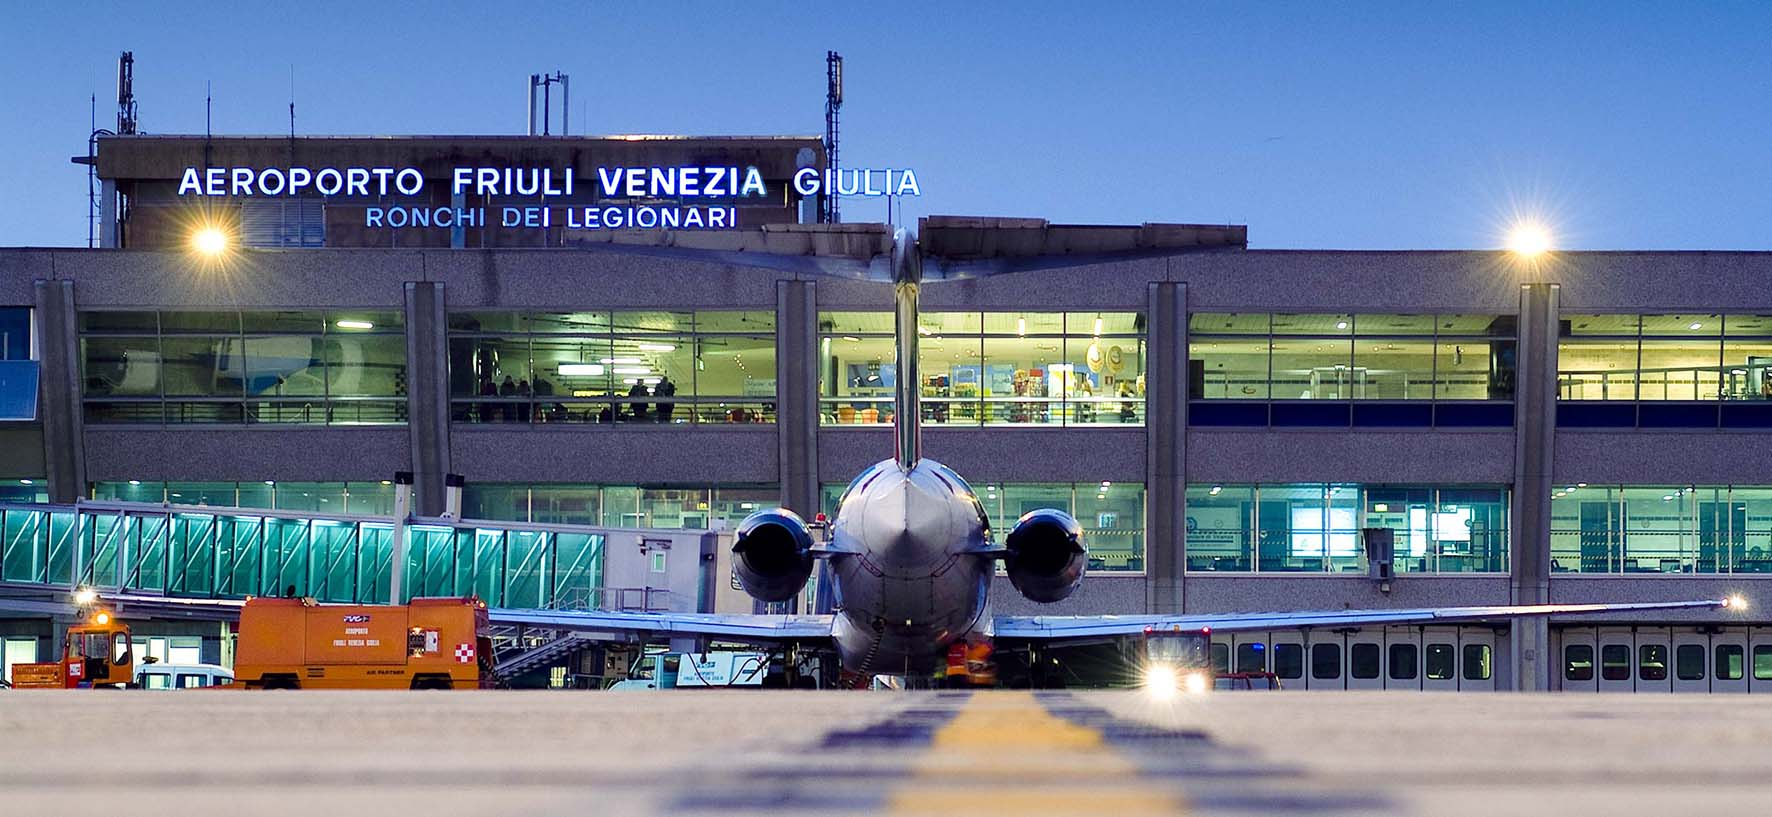 Aeroporto Trieste Ronchi legionari Veduta zona air side